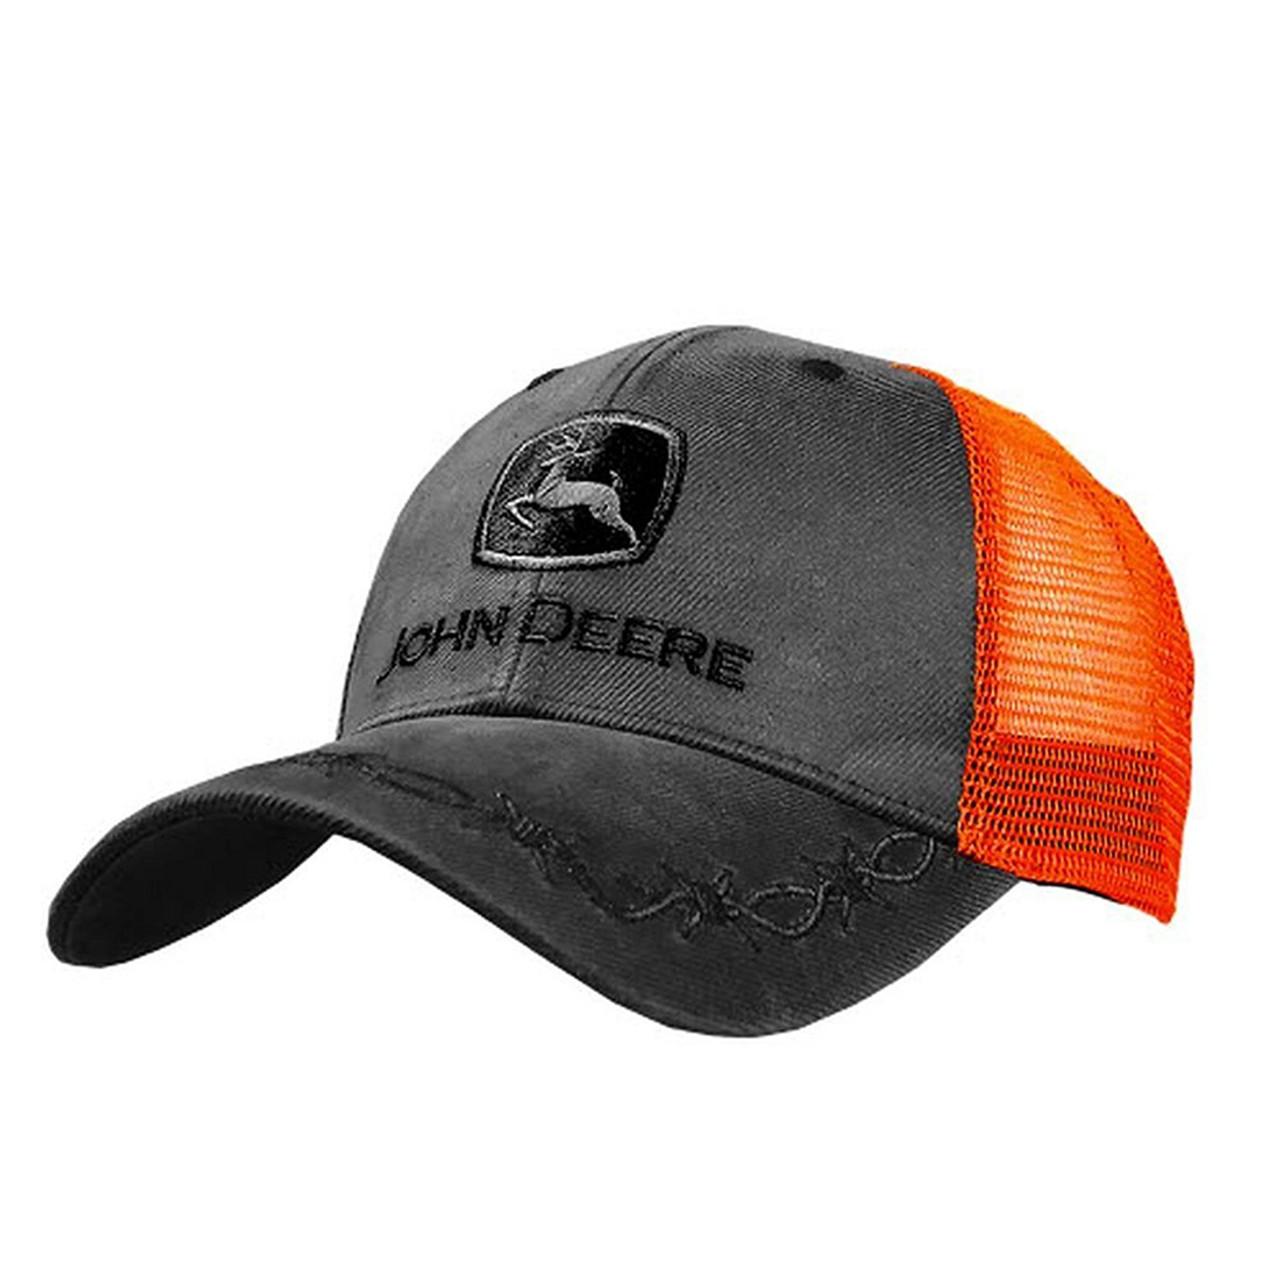 5c58cf1711f John Deere Mens Oilskin High Visibility Orange Mesh Back Embroidered Hat -  Trenz Shirt Company